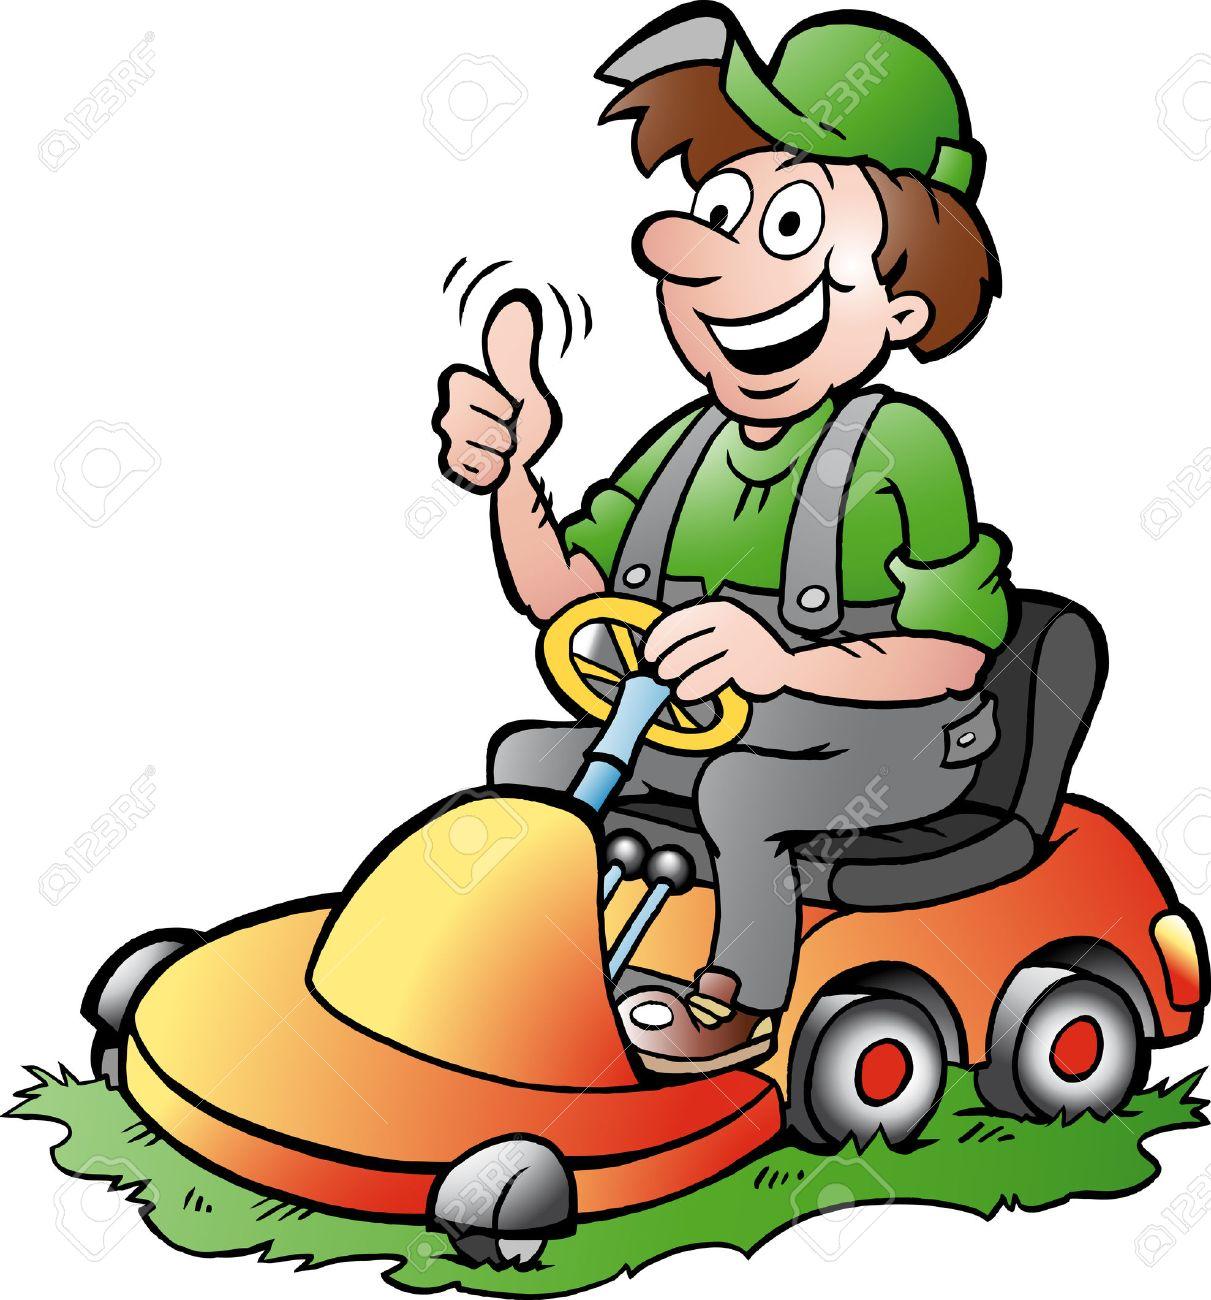 Cartoon cowgirl hat lawn mower clipart free jpg download Cartoon Lawn Mower Clipart | Free download best Cartoon Lawn Mower ... jpg download